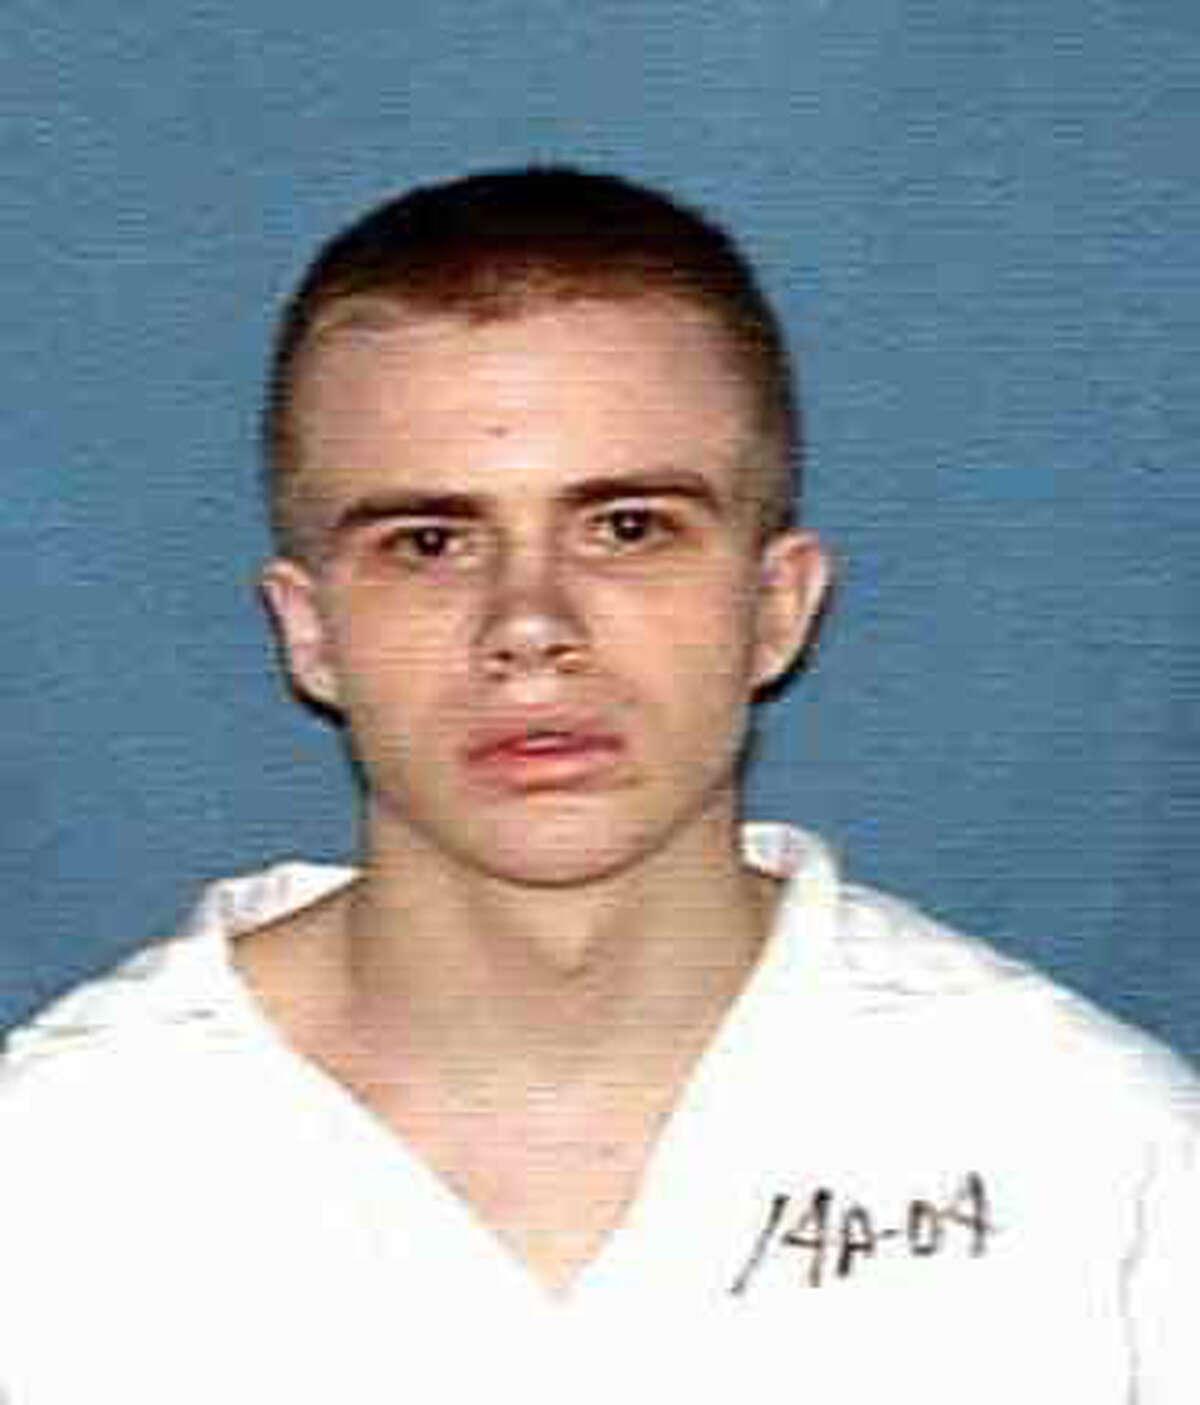 Robert Pruett (cq), Houston resident, has been indicted for the murder of a prison guard in Beeville, Tx. HANDOUT PHOTO HOUCHRON CAPTION (03/22/2000): Pruett.